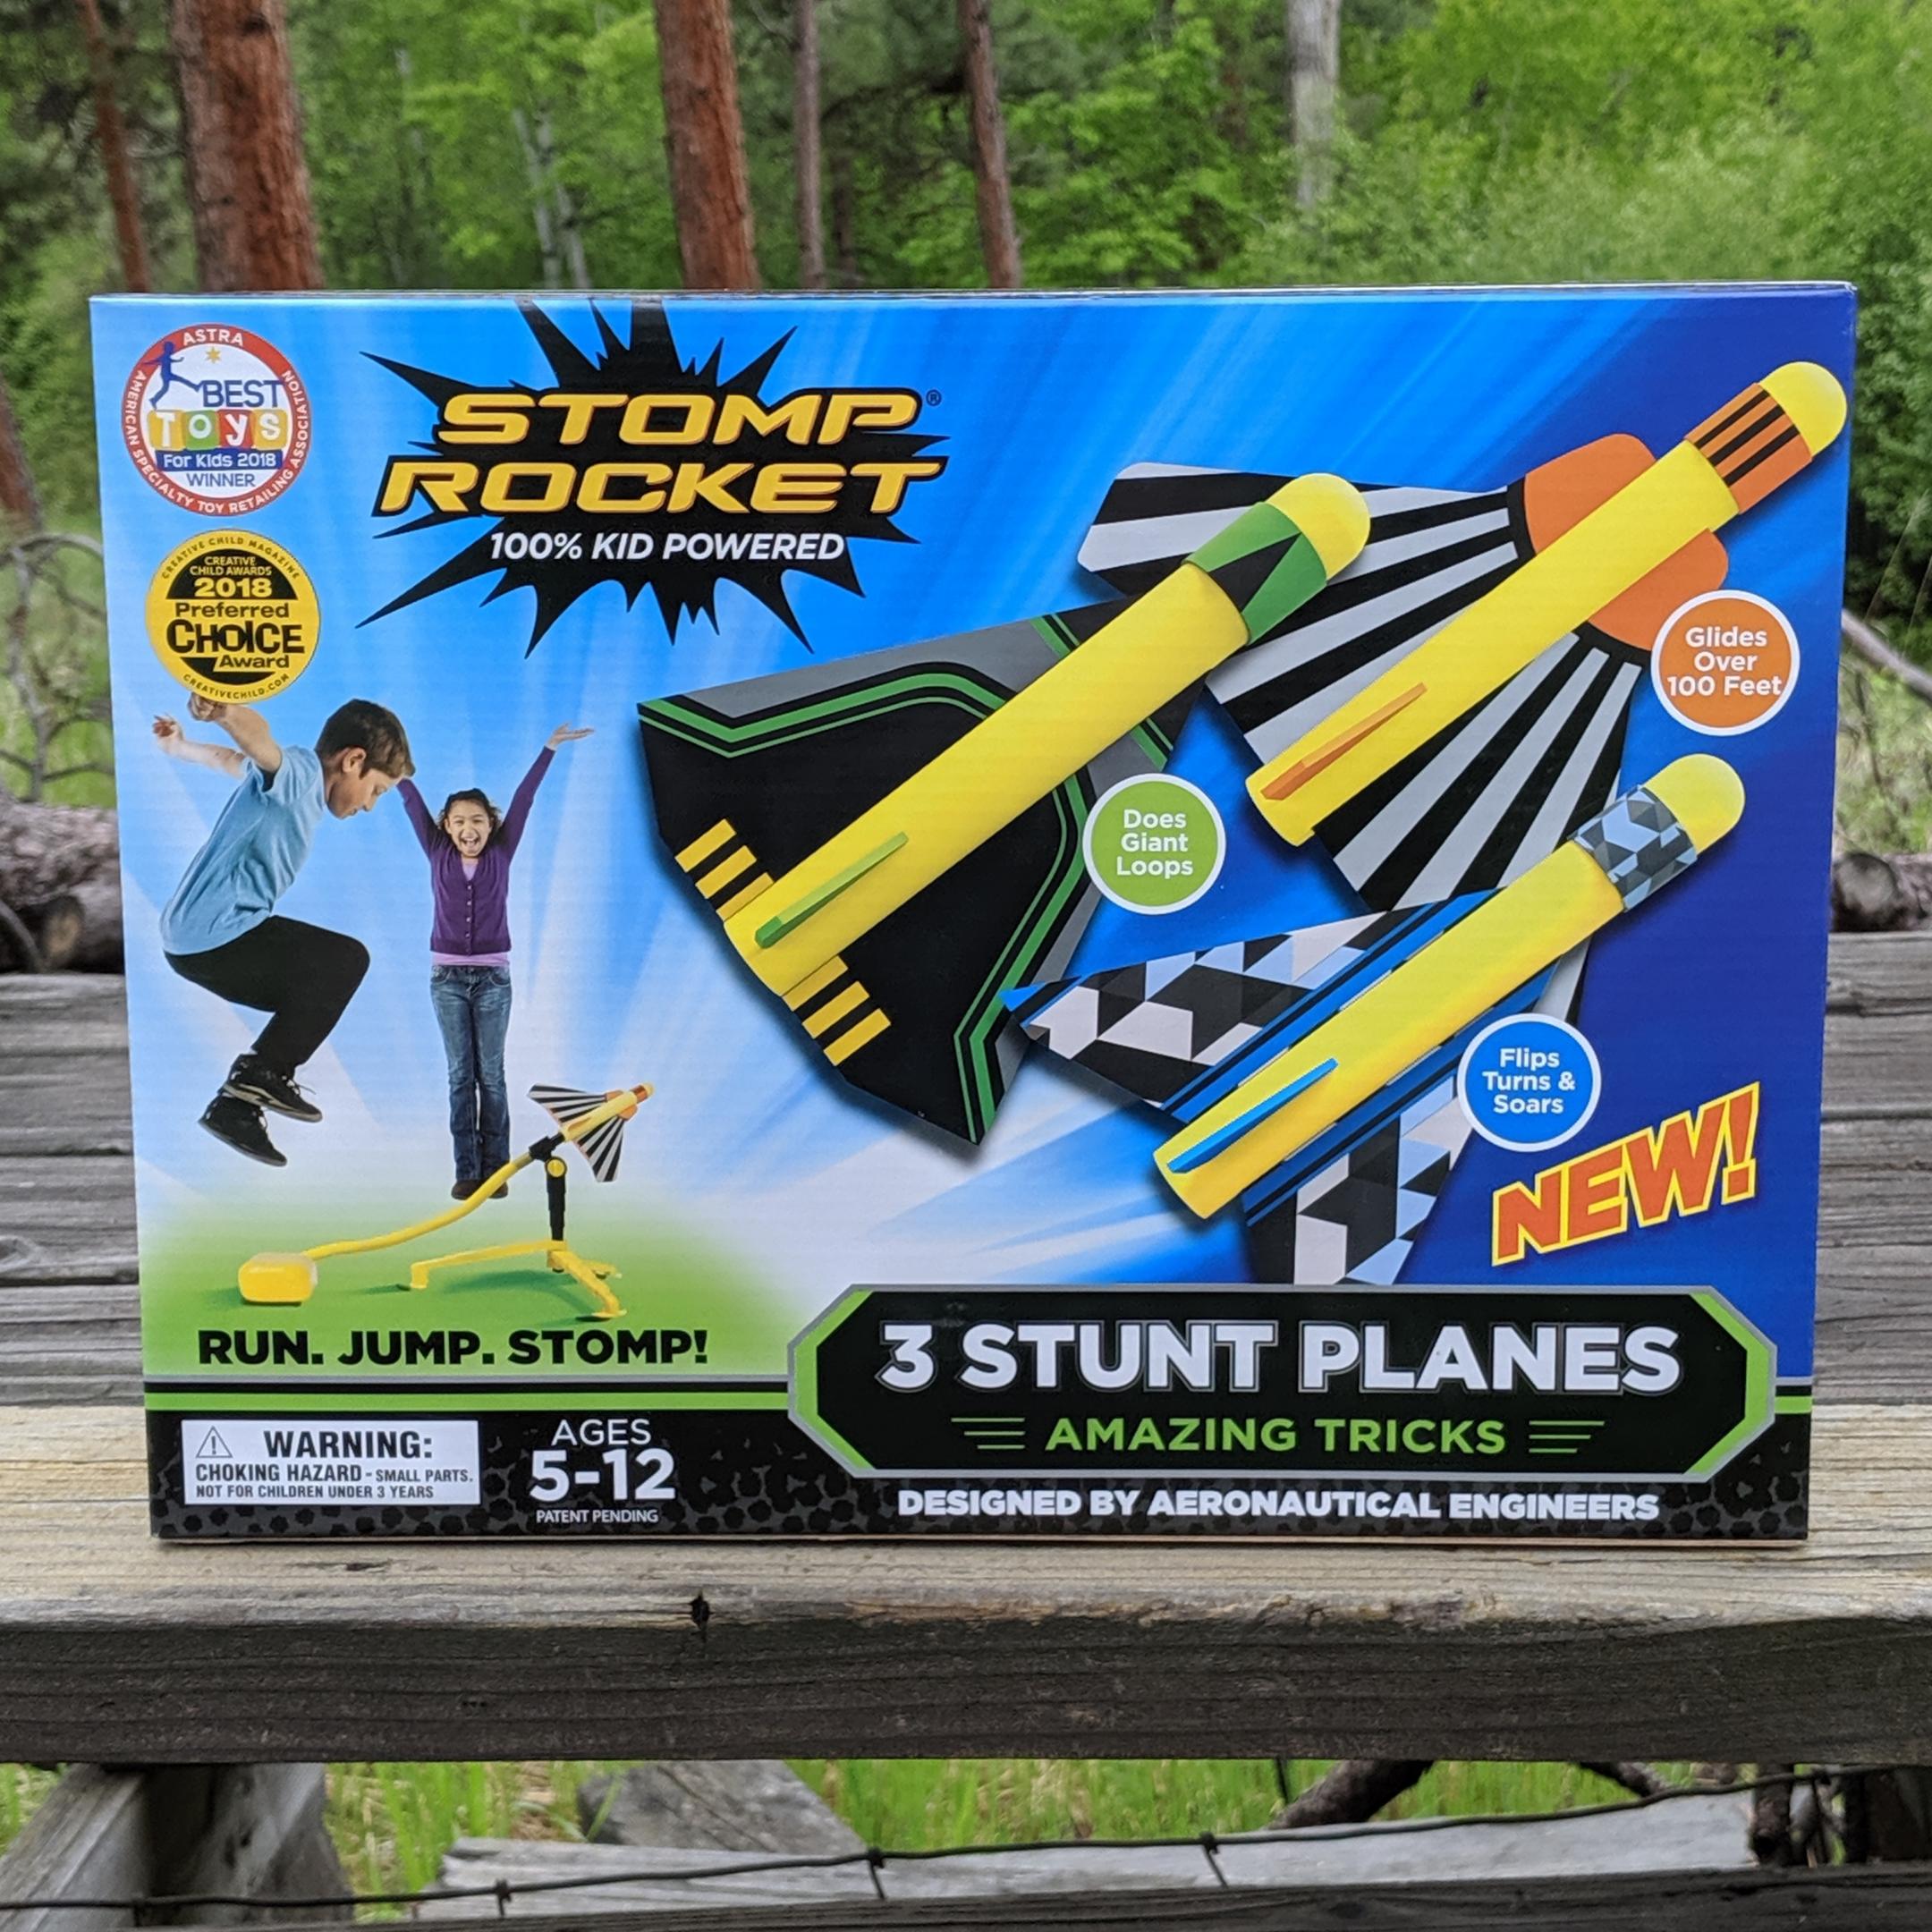 Stomp Rocket Stunt Planes